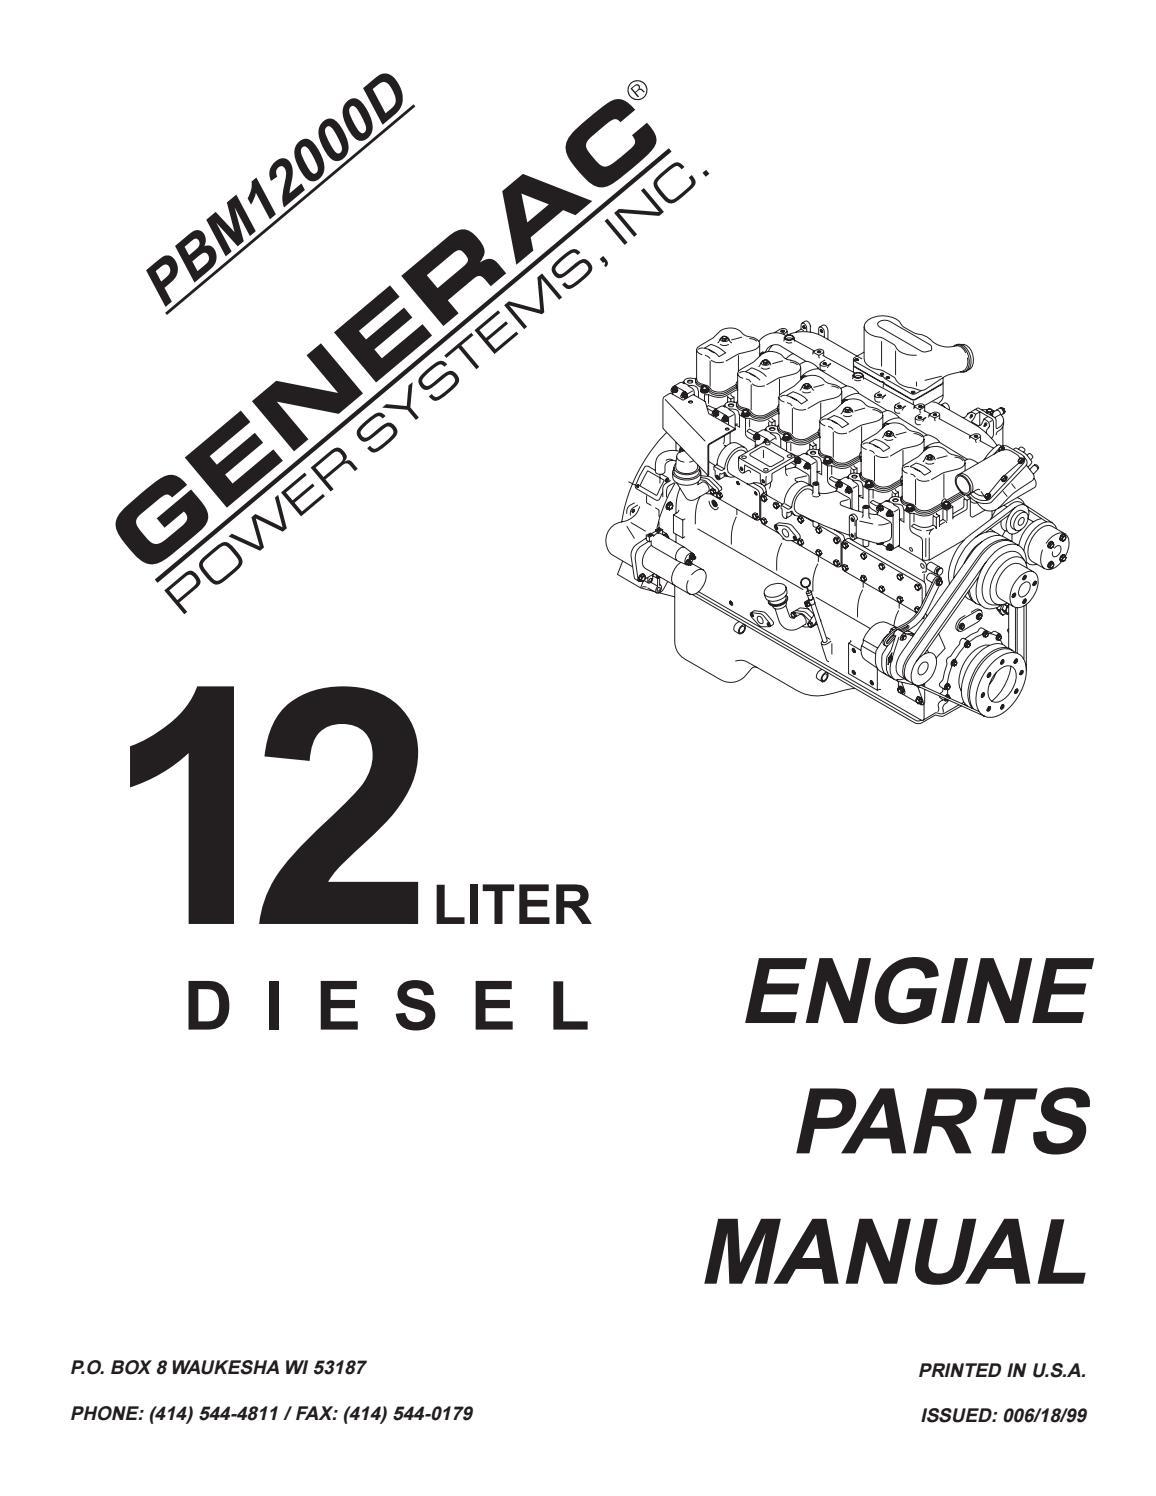 Generac Generator 12 Liter Diesel Mitsubishi Engine Parts